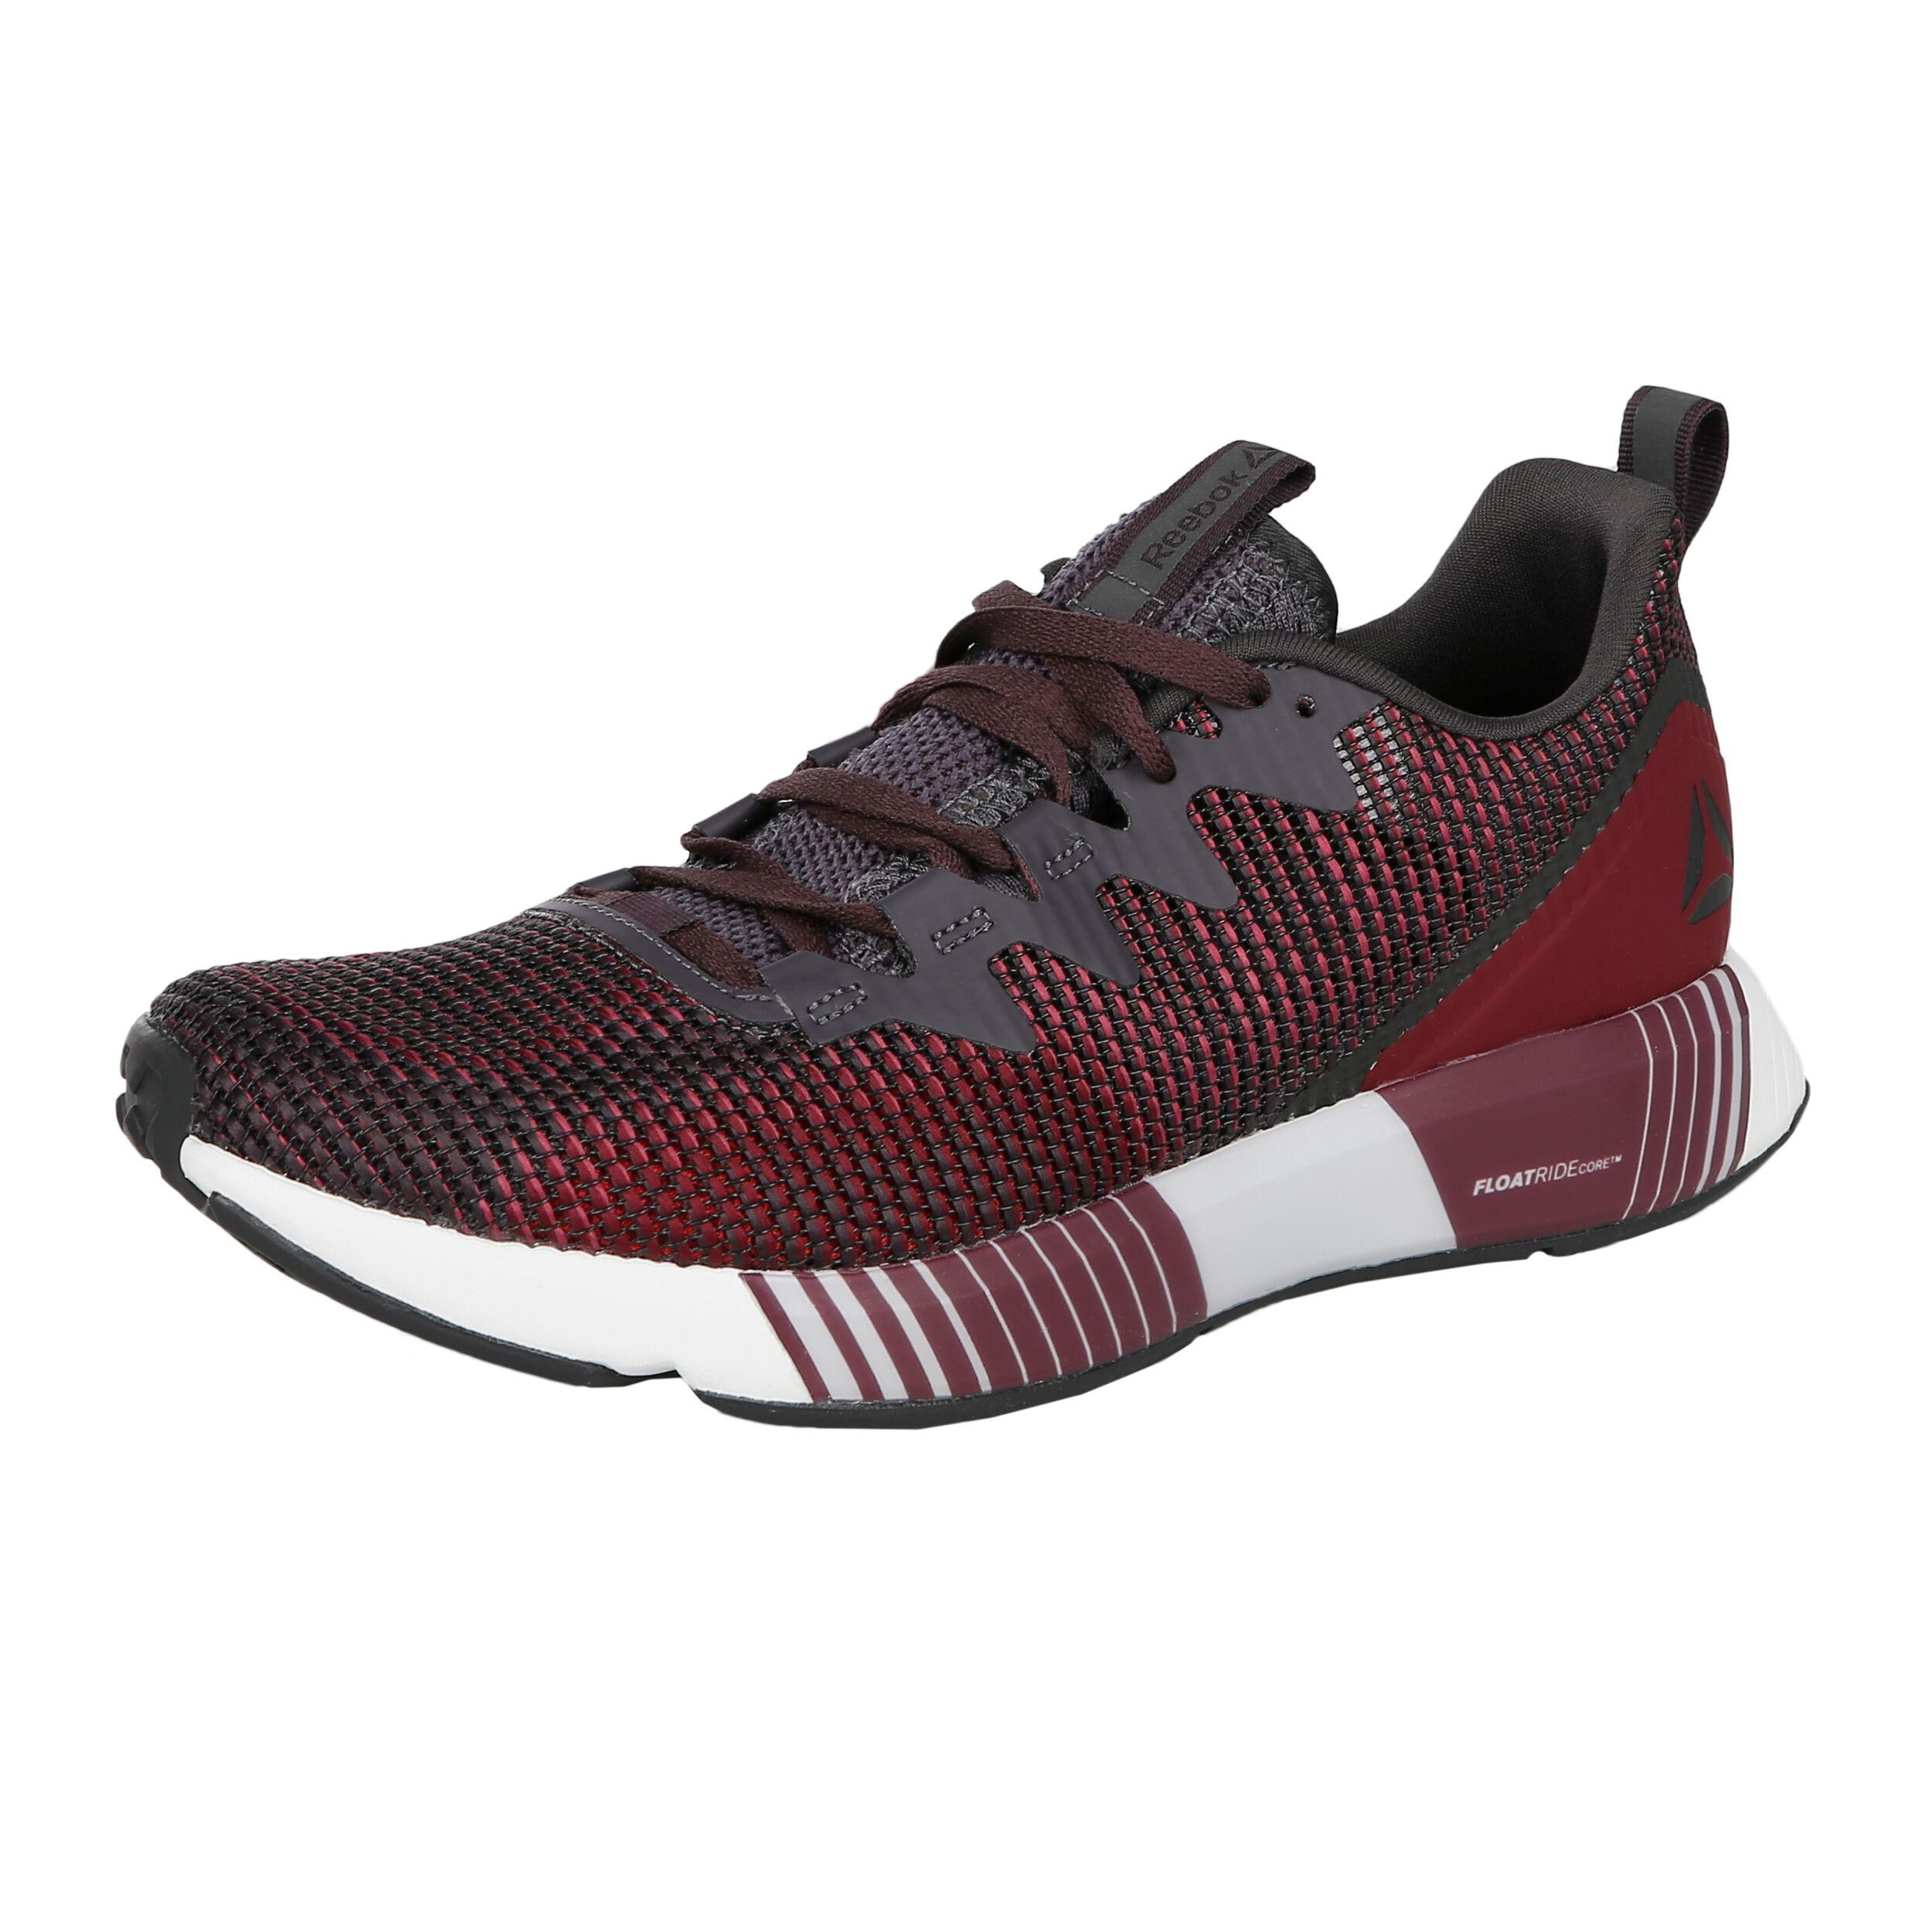 Buy % Sale % from Reebok online | Jogging Point